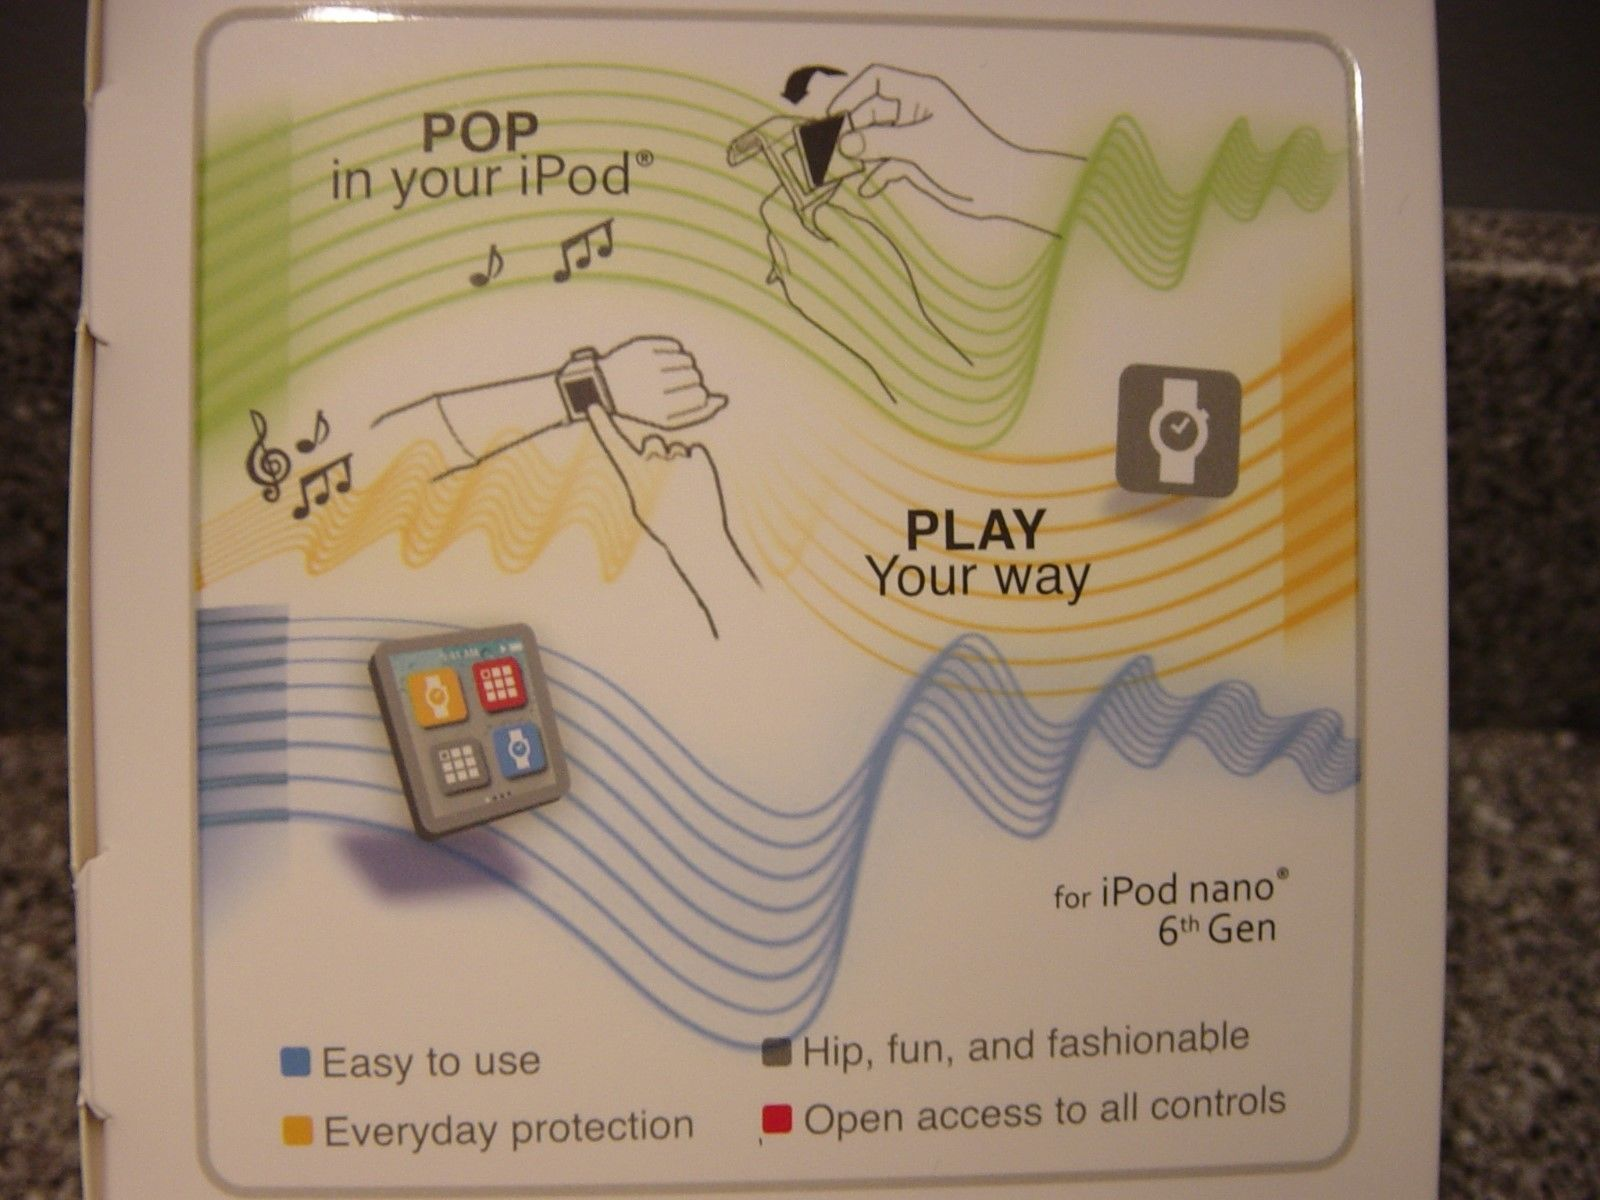 Icvrd Ipod Nano Watch Carrier For Ipod Nano 6th Generation Includesdigital Watch Ebay Ipod Nano Ipod Nano Watch Nano 6